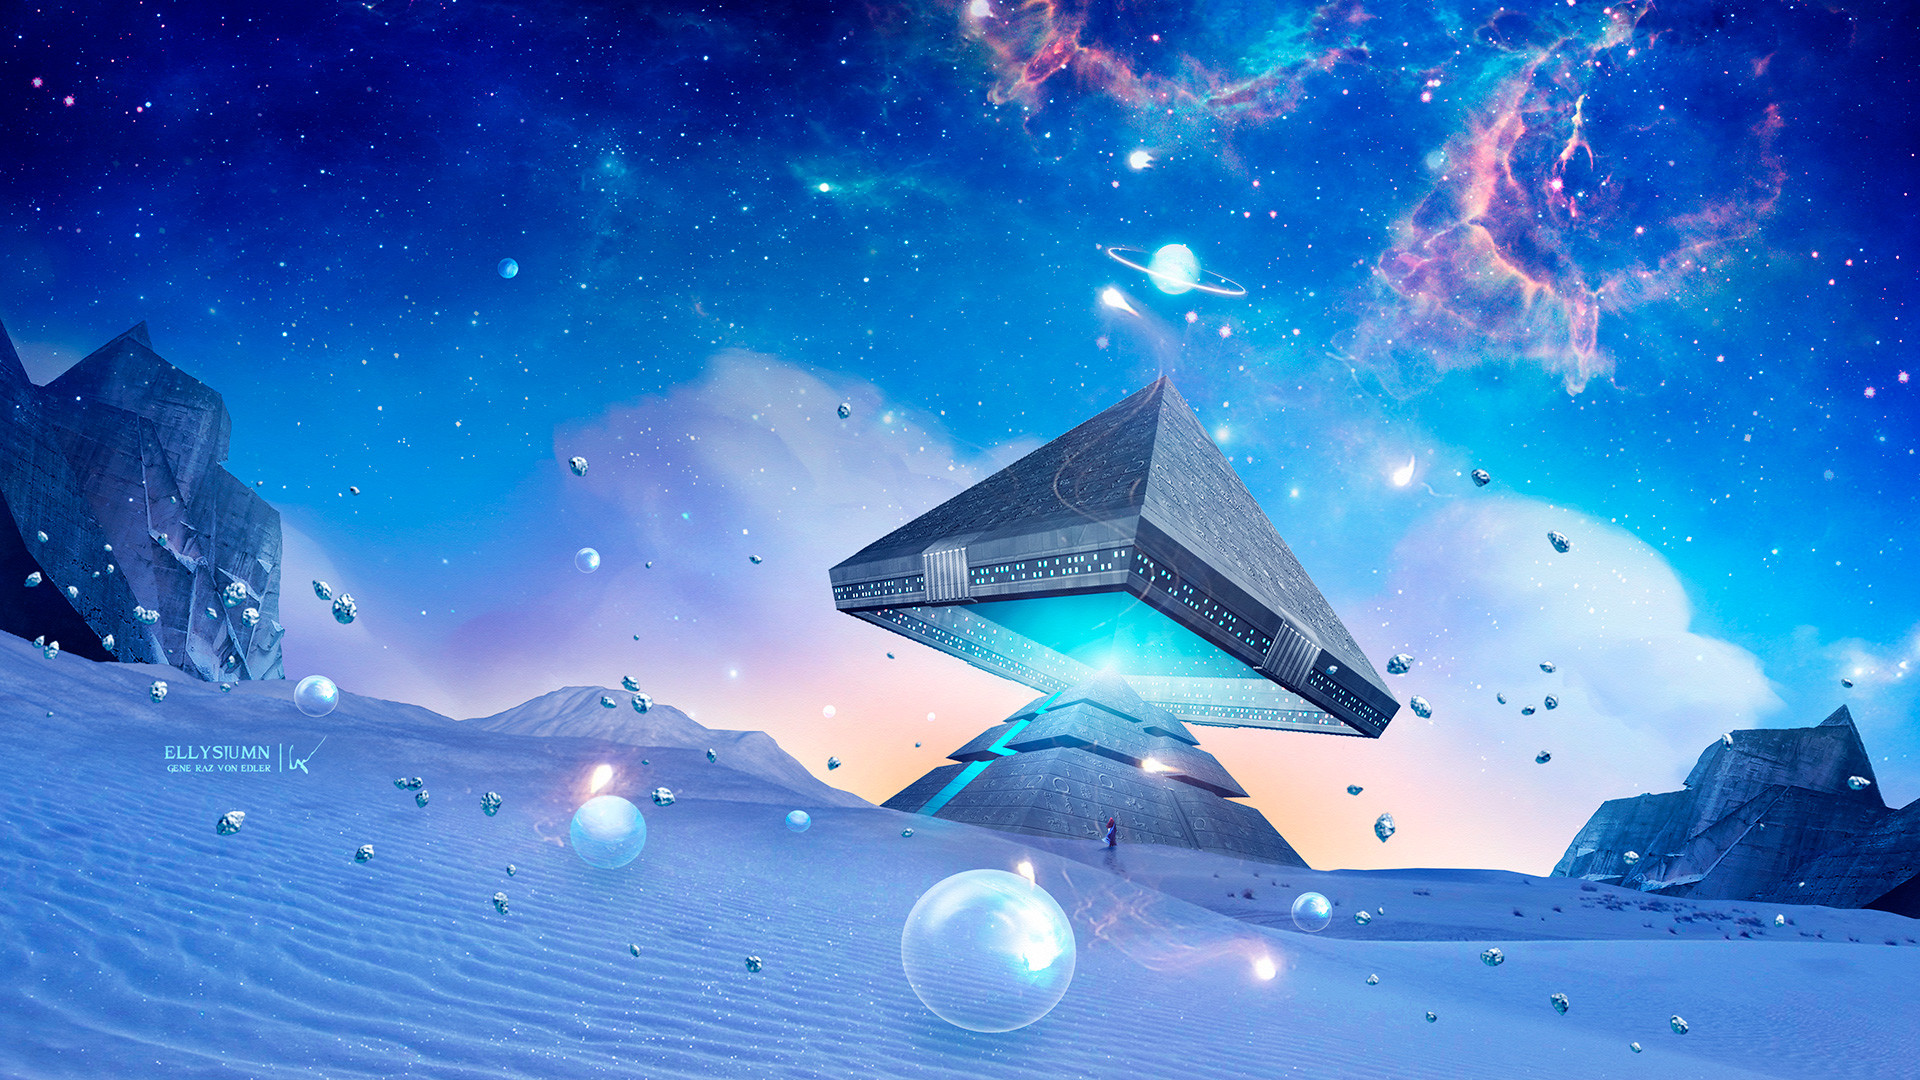 Building Girl Planet Pyramid Sand Starry Sky 1920x1080